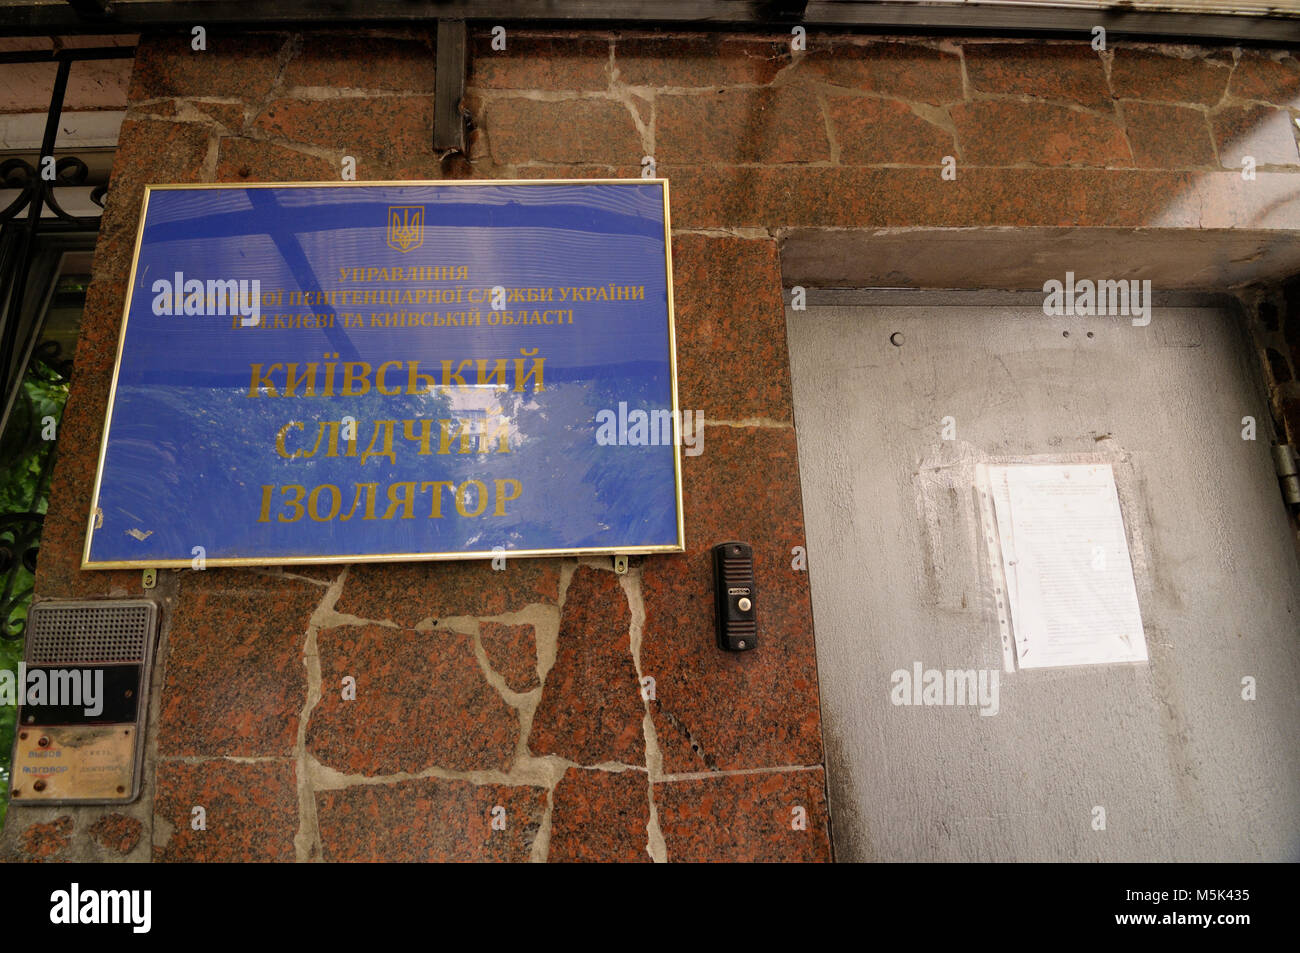 Sign and doors of Lukyanovskaya detention facility (SIZO). July 19, 2017. Kiev, Ukraine - Stock Image